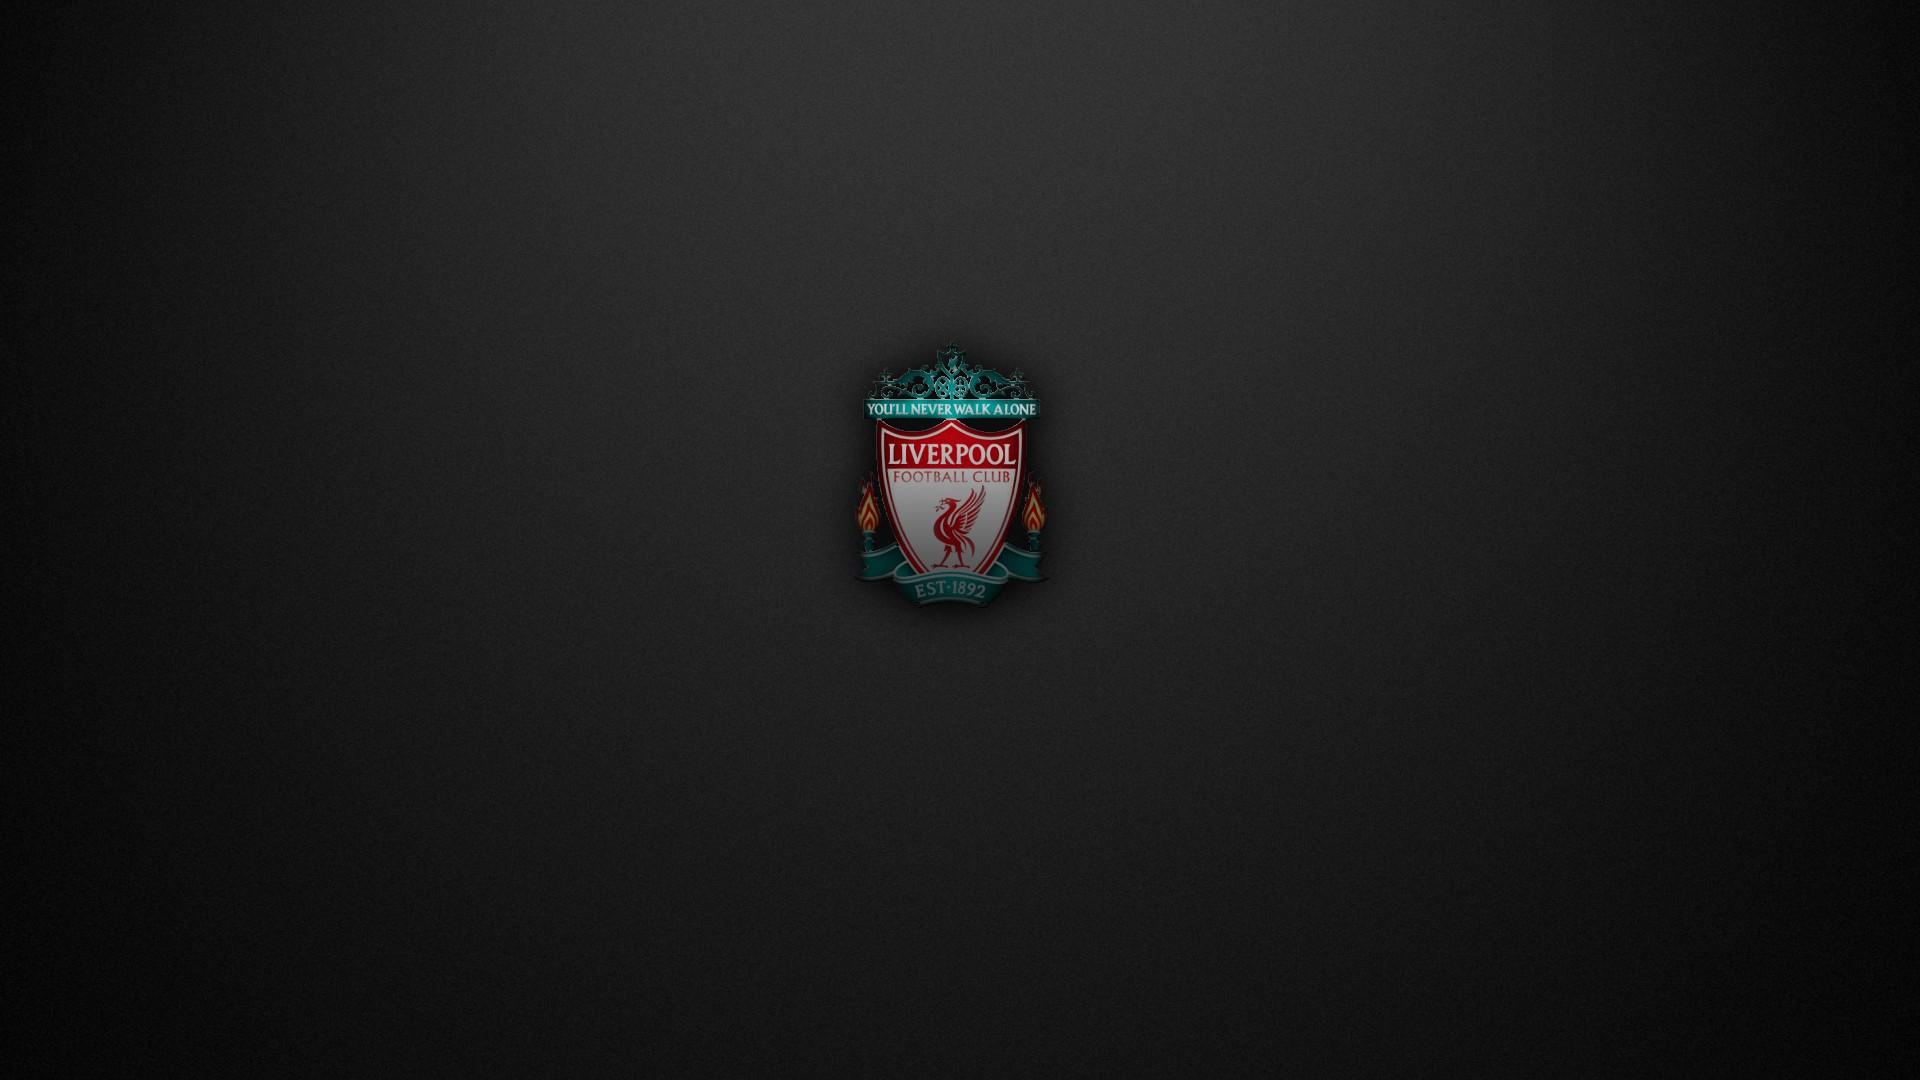 Wallpaper Hd Arsenal Free Download Liverpool Backgrounds Pixelstalk Net